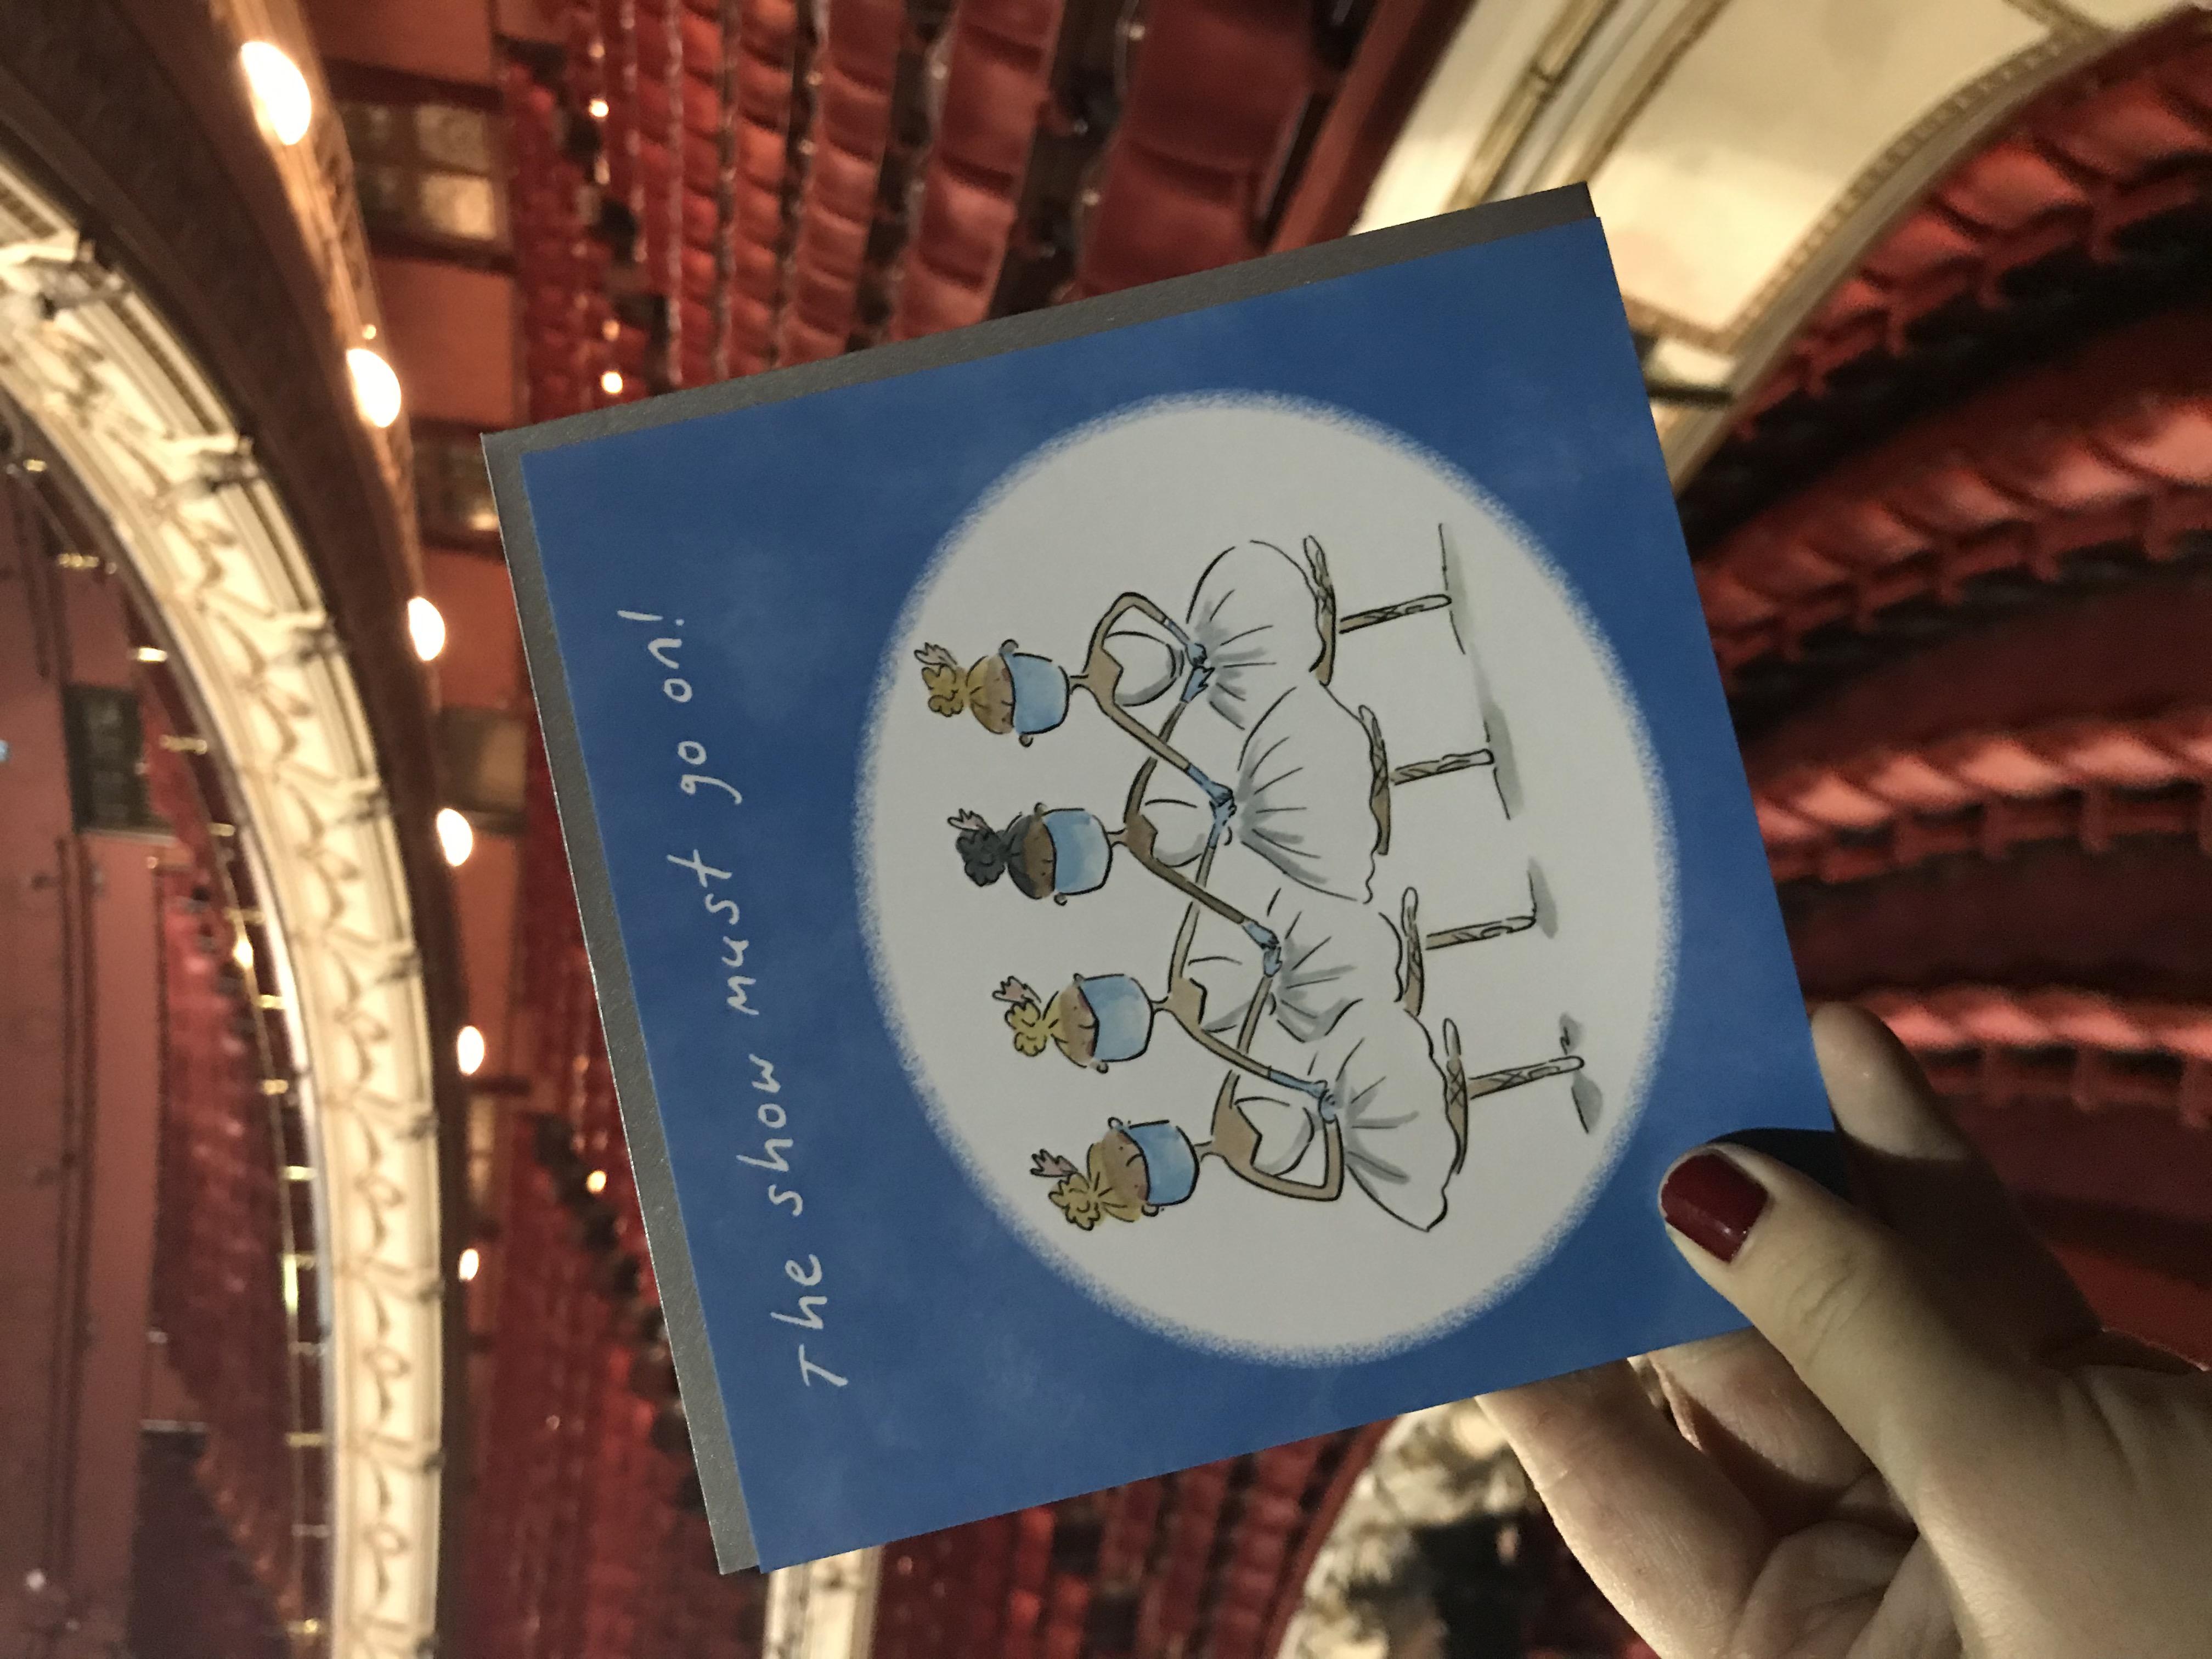 Above: Rosie Brooks' artwork on a Holy Mackerel card.